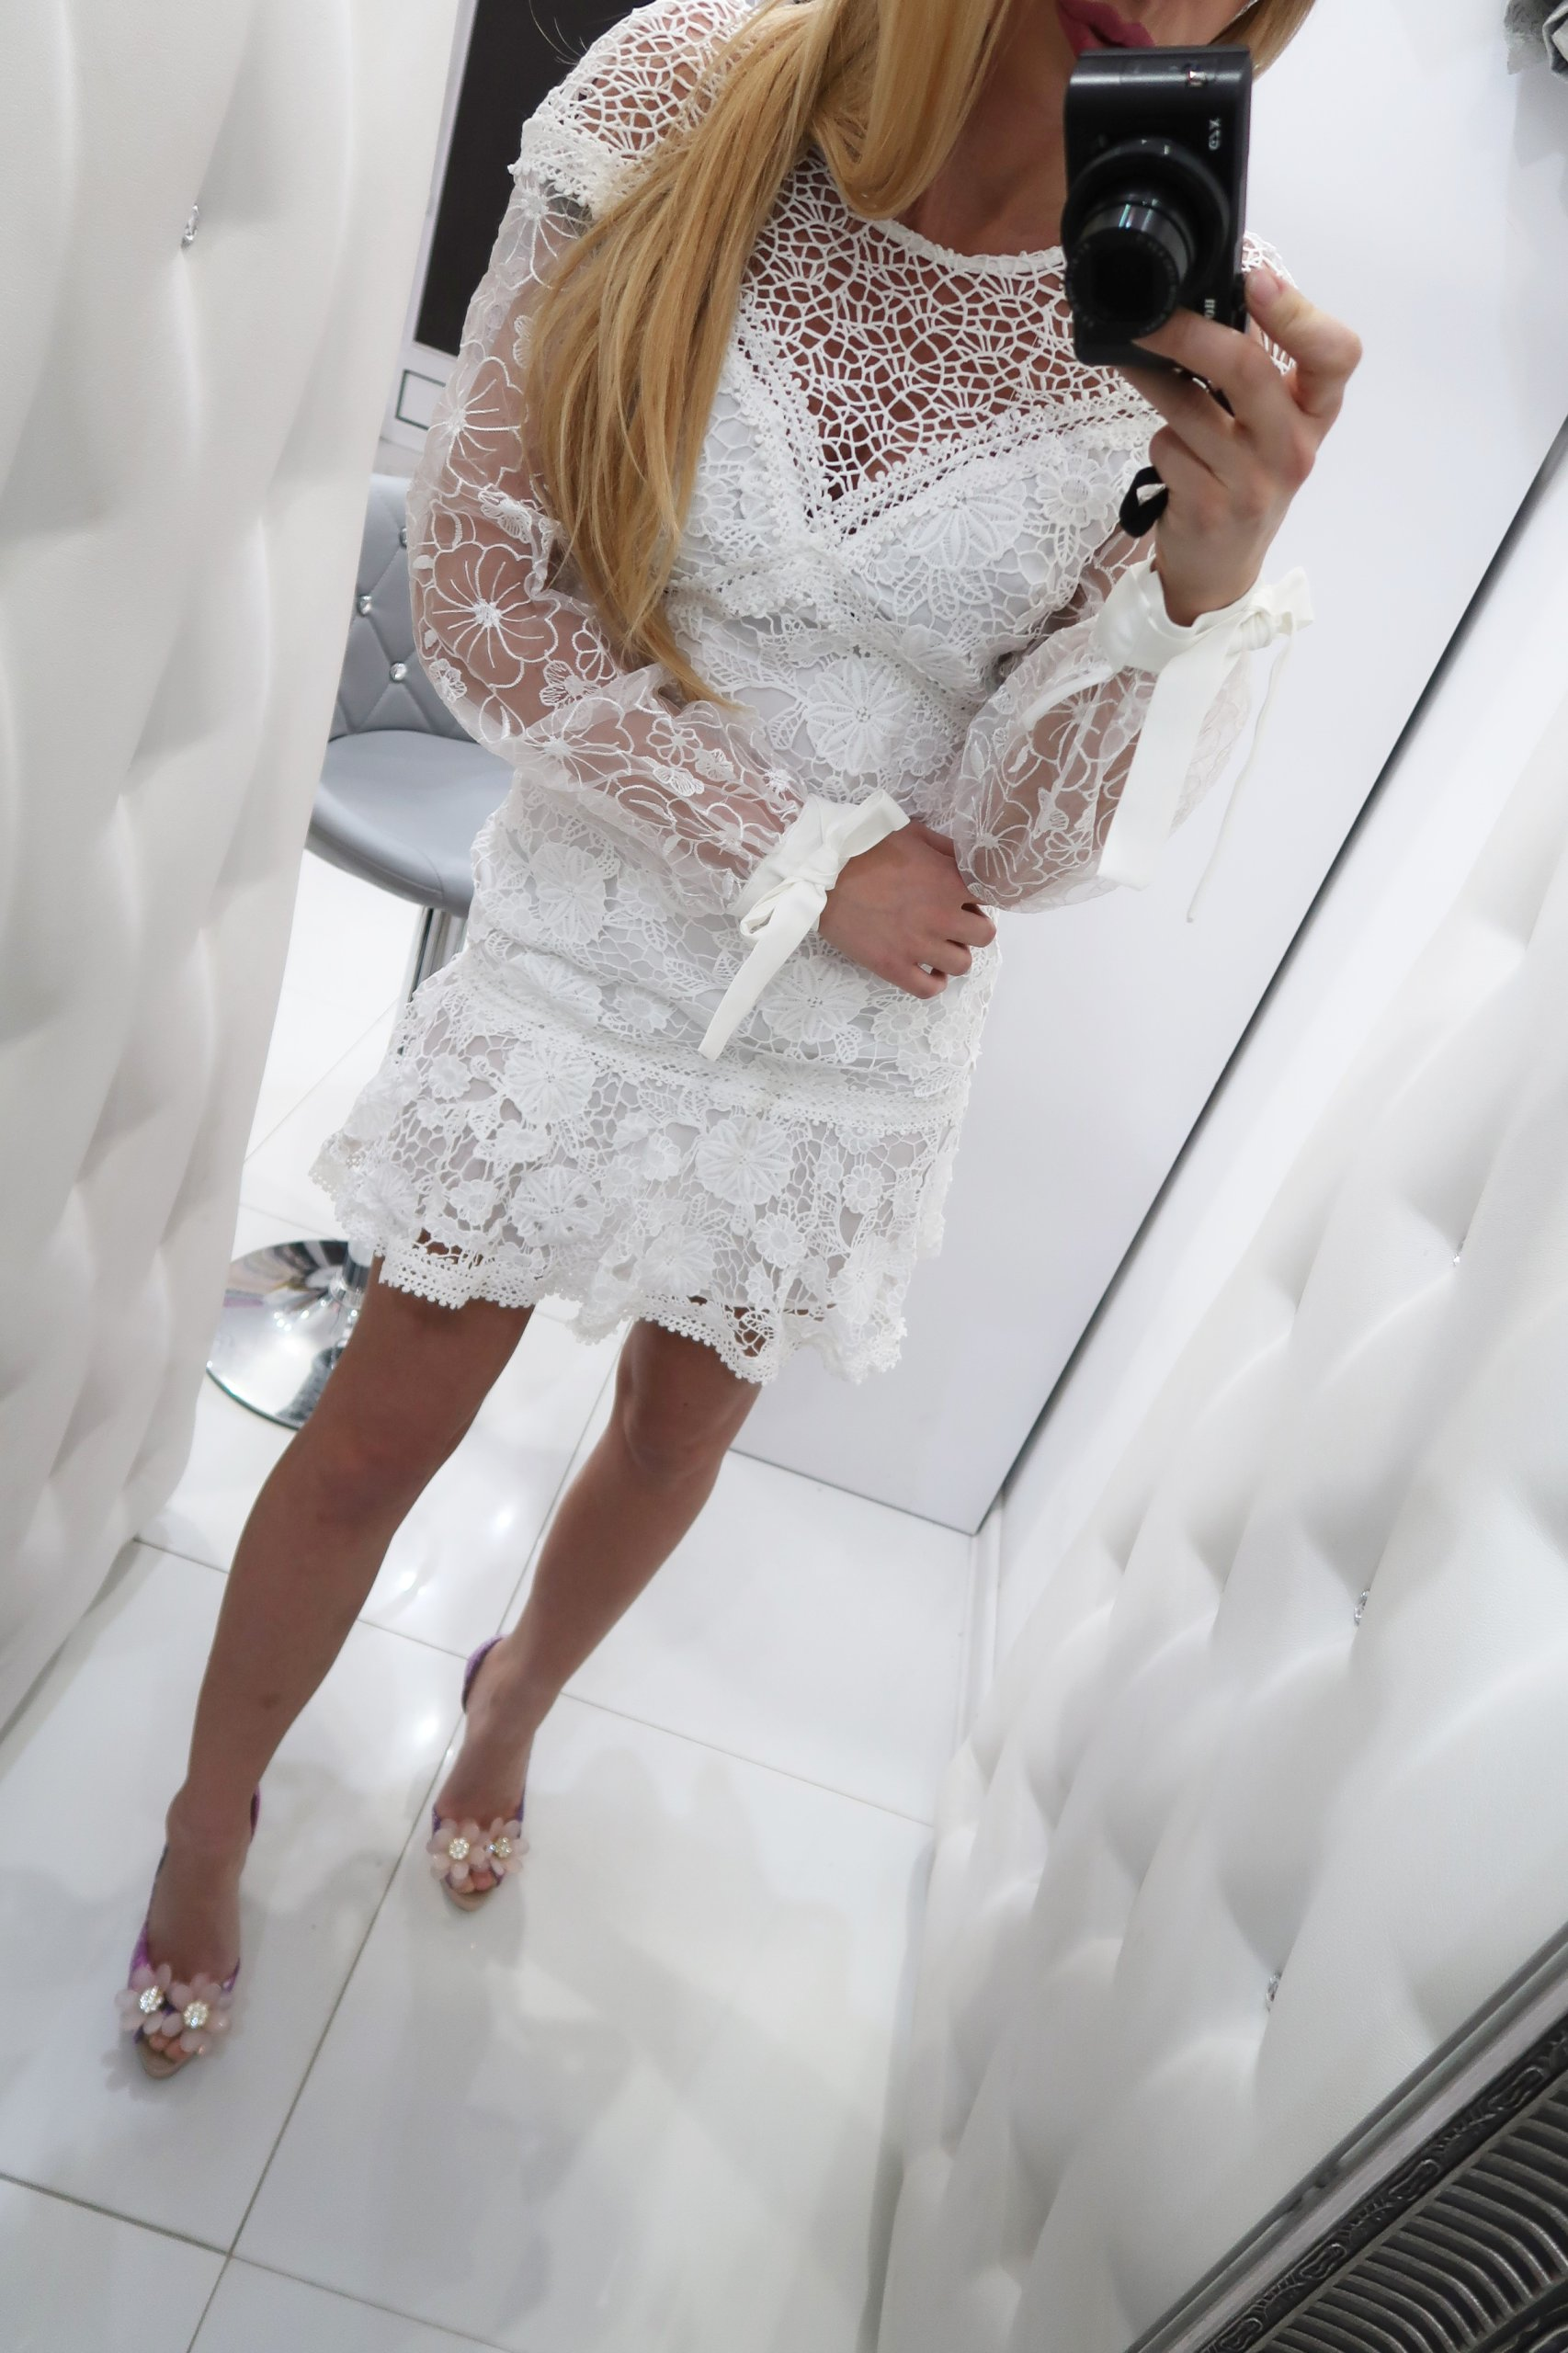 358023ec2637 sukienka ecru gipiura elegancka zdobiona hit XS - 7442332789 ...